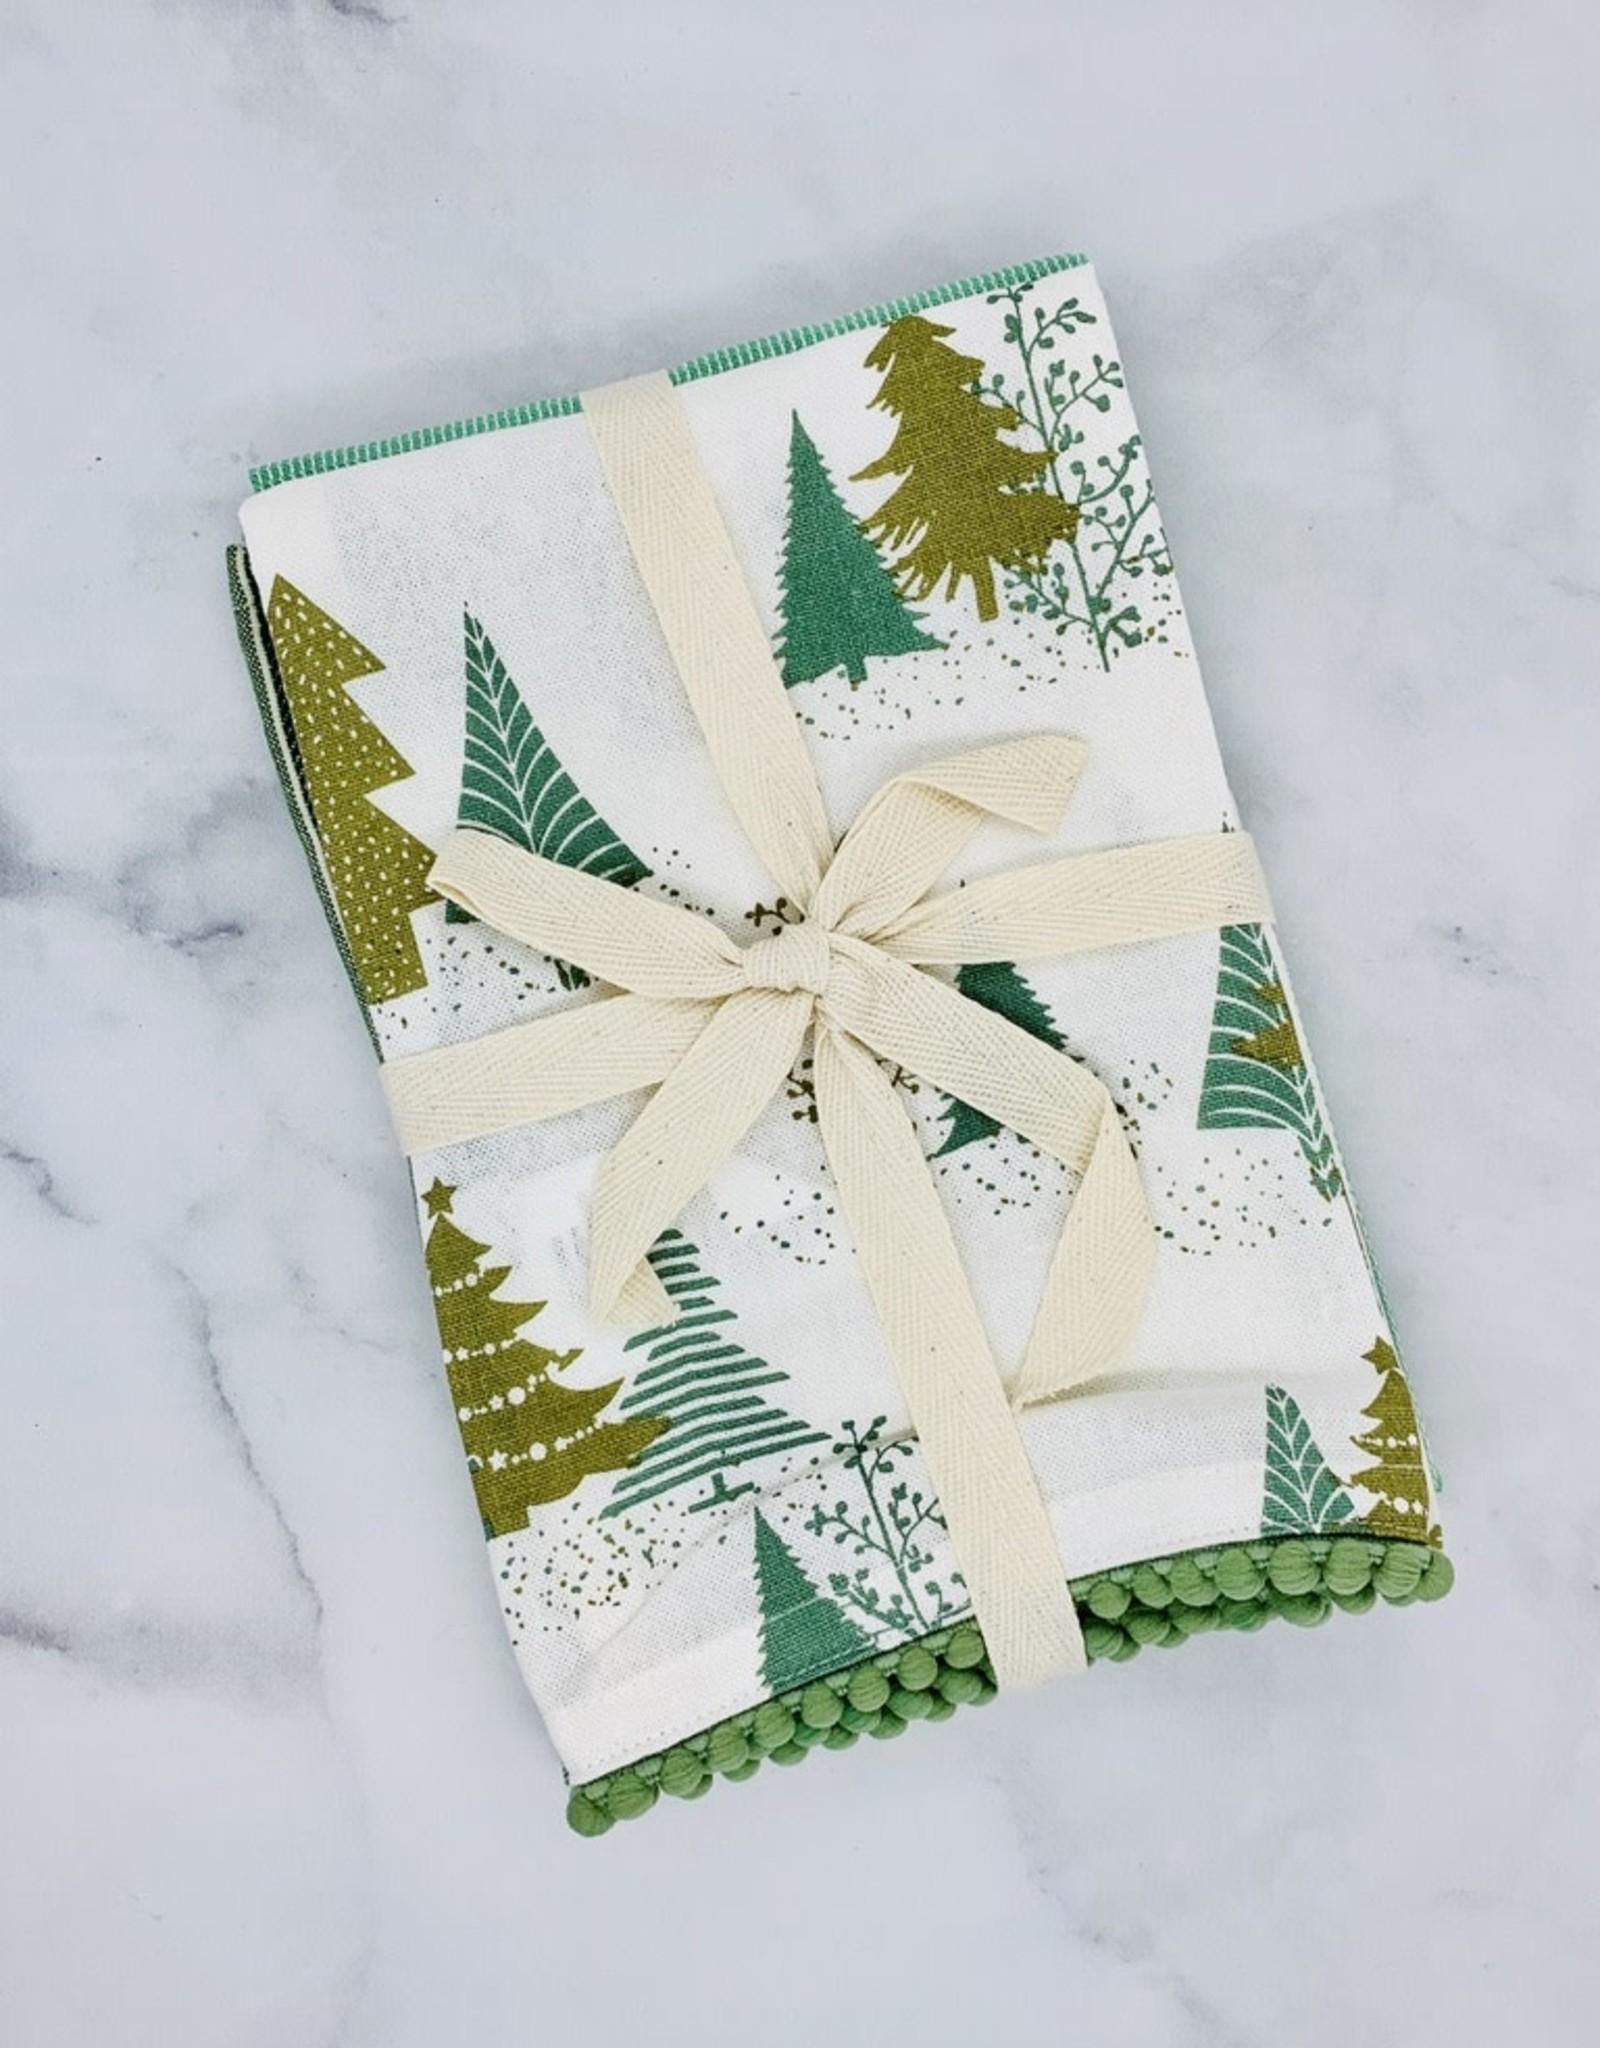 Wintergreen Set/3 Cotton Printed Tea Towels